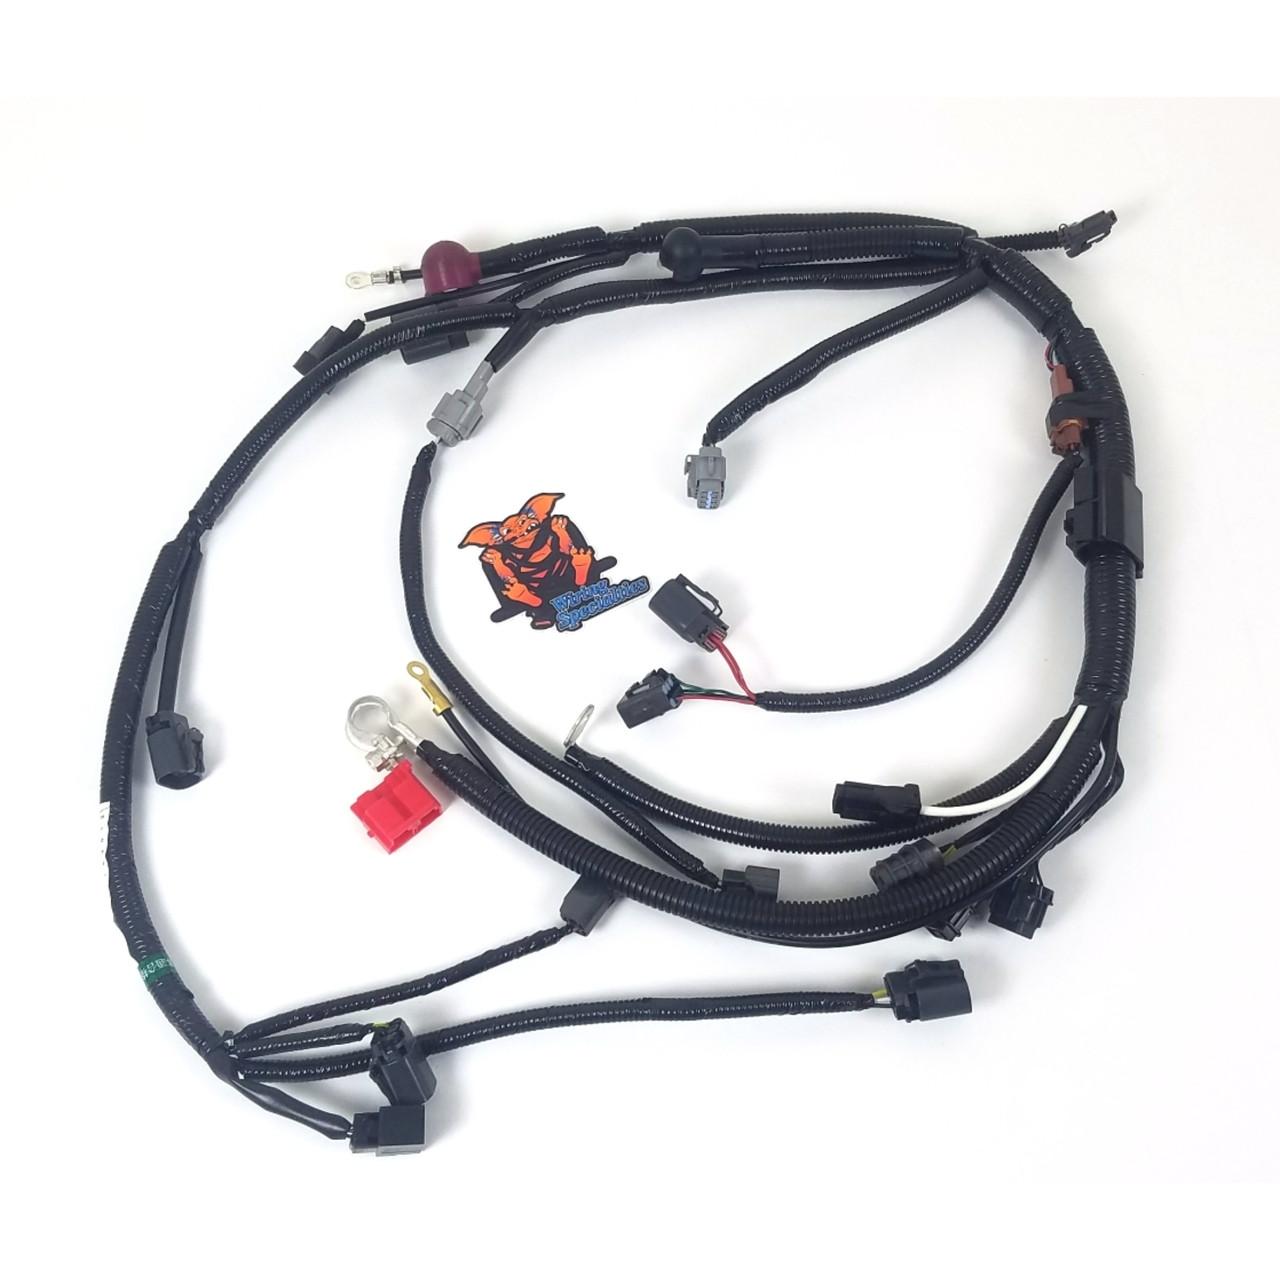 Wiring Specialties S14 KA24DE Lower Harness for 240SX S14 - Enjuku Racing  Parts, LLCEnjuku Racing